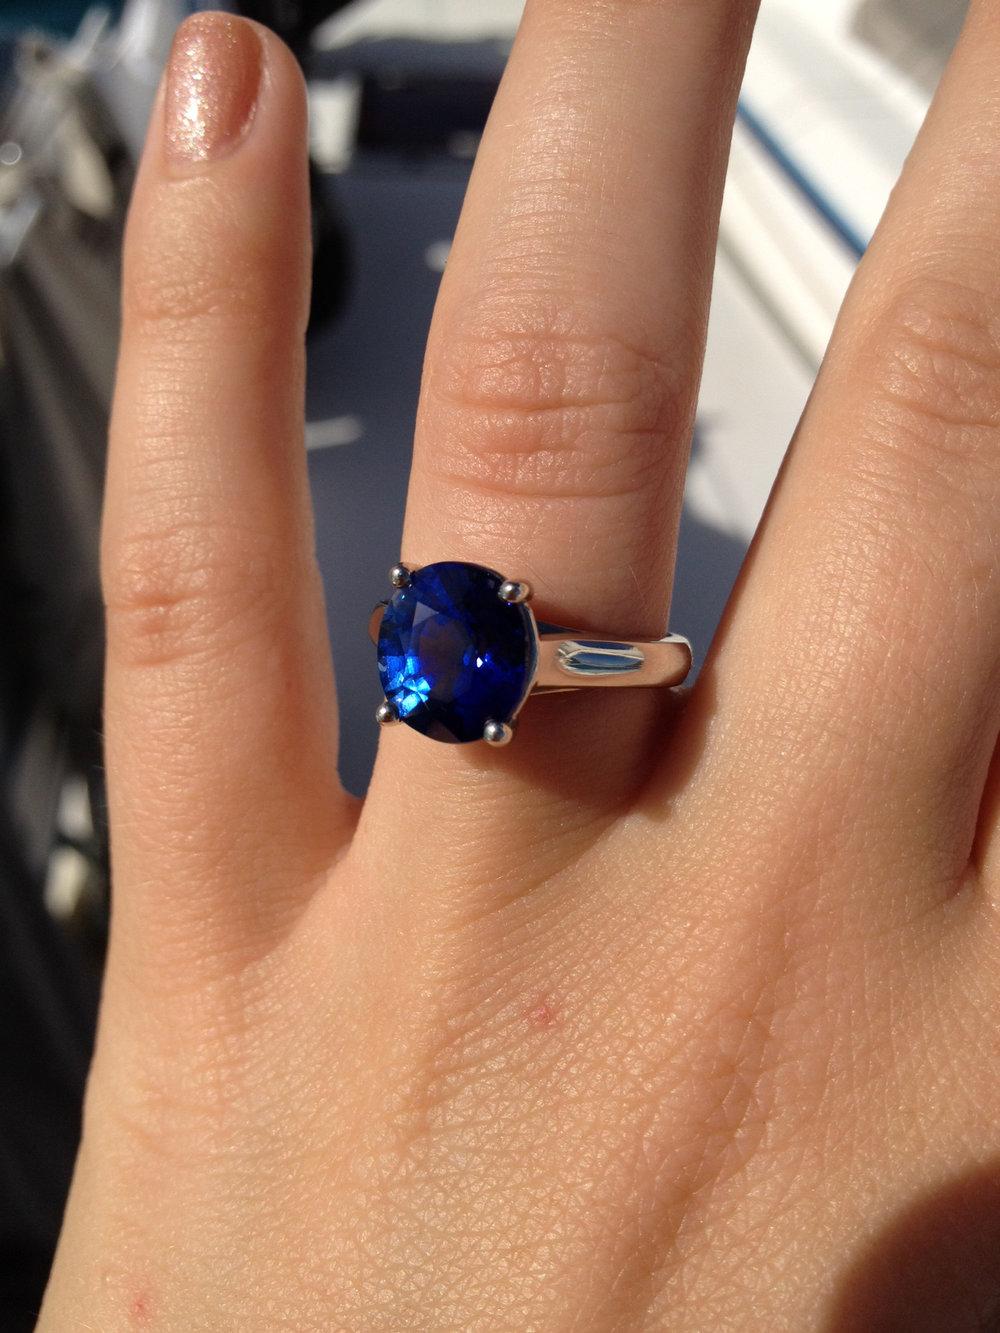 Dark blue sapphire engagement ring